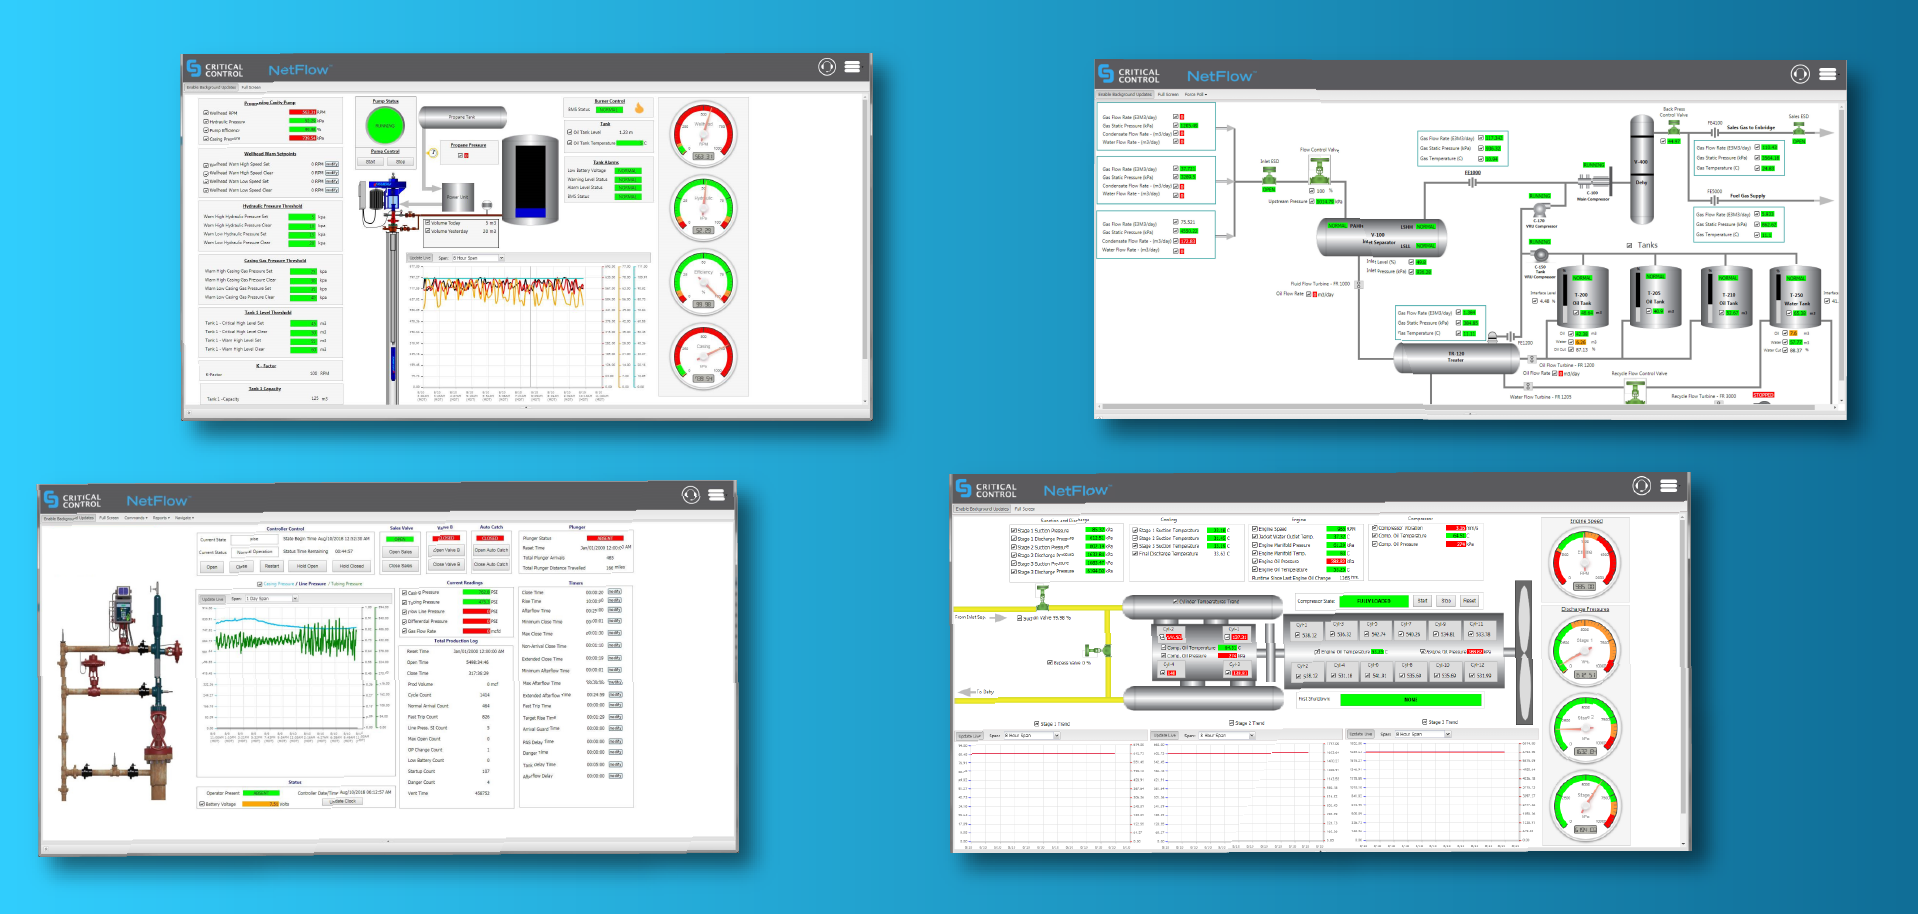 NetFlow Screenshot 2-01.png